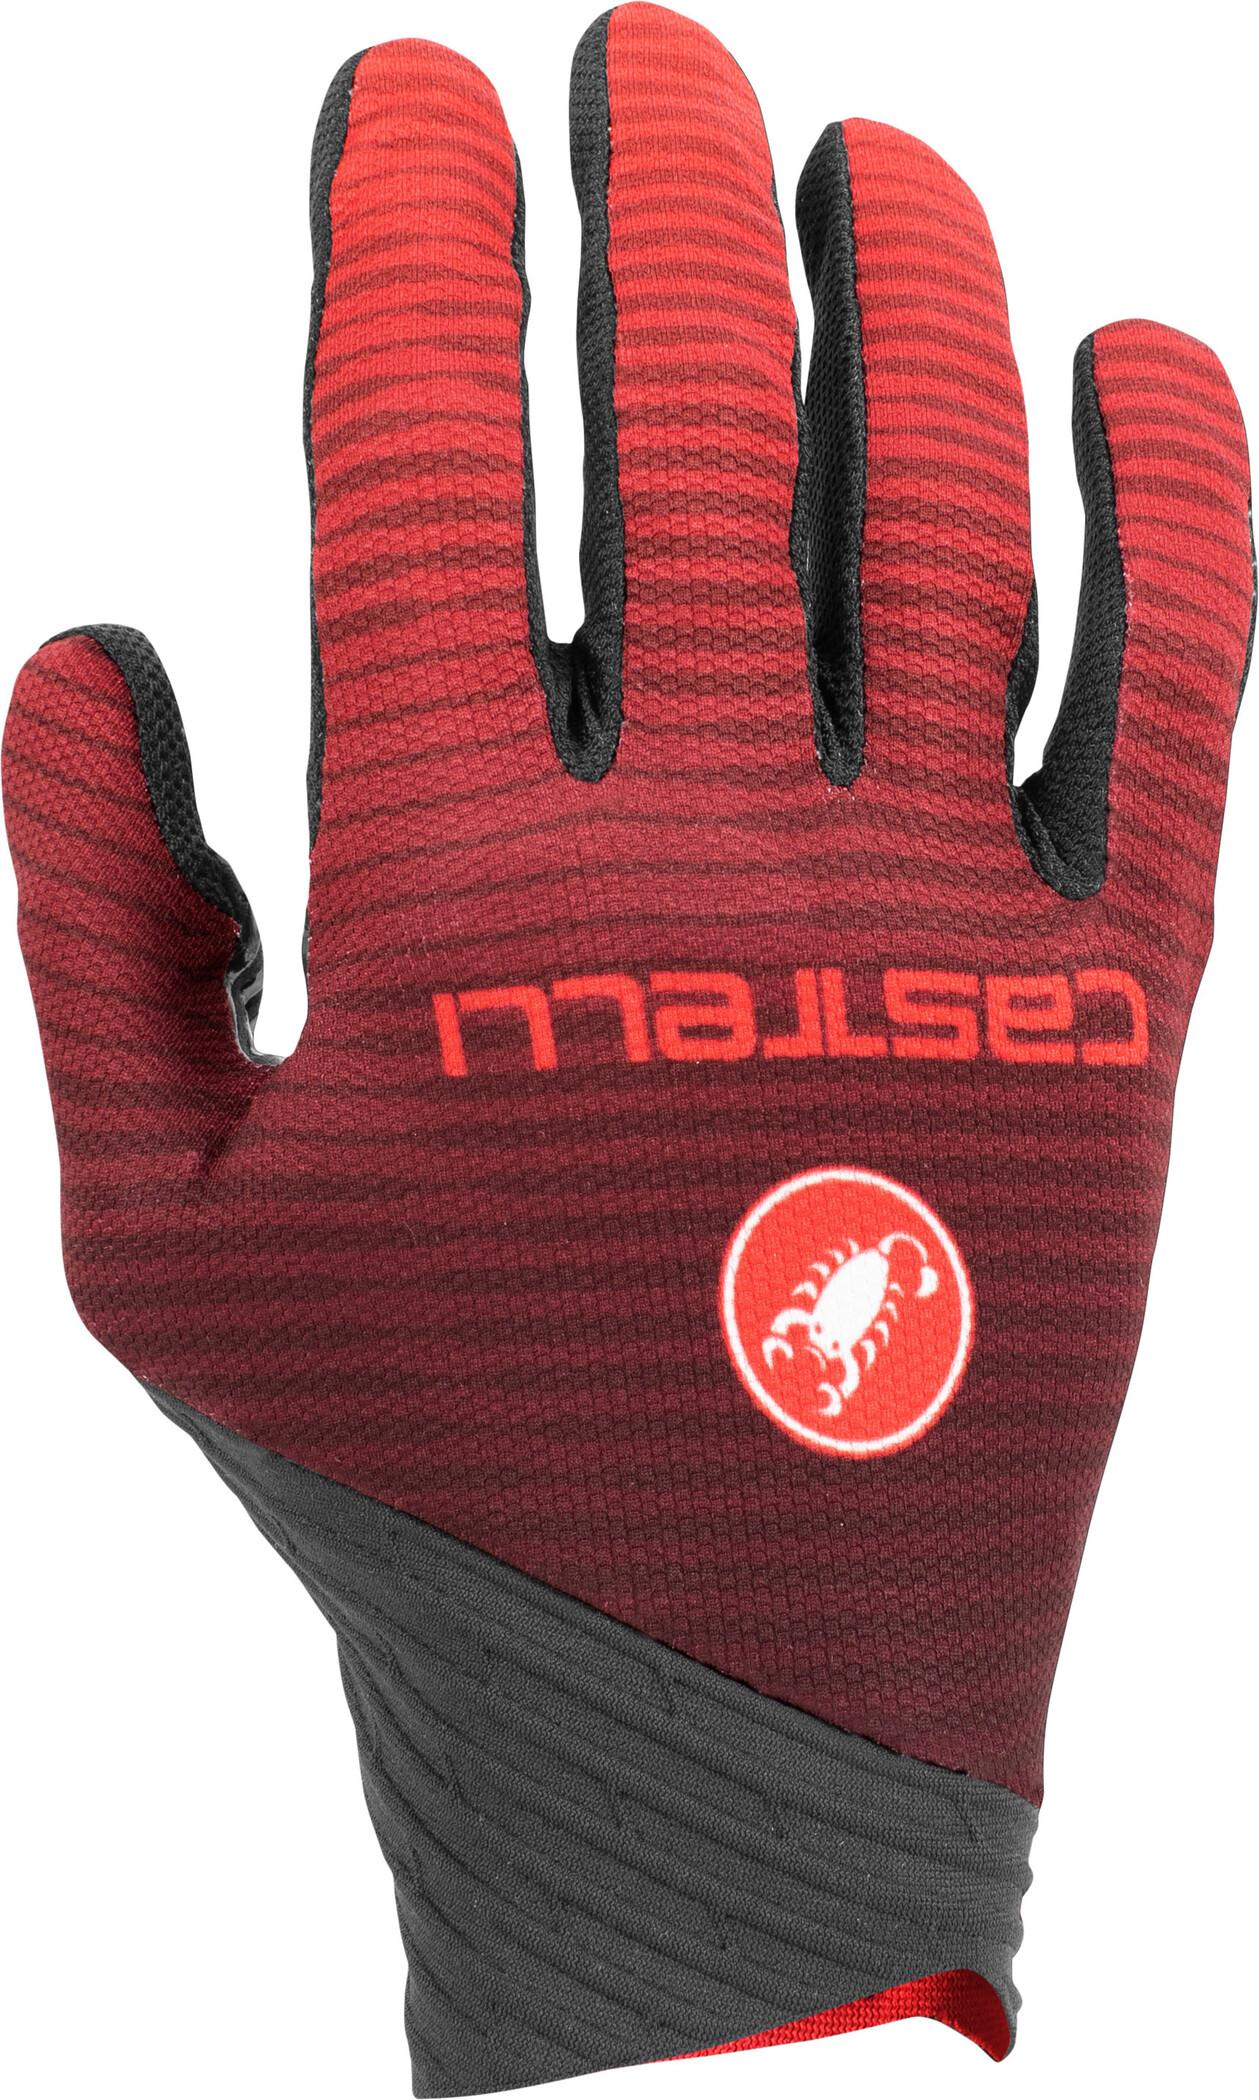 Castelli CW 6.1 Cross Gloves | Gloves